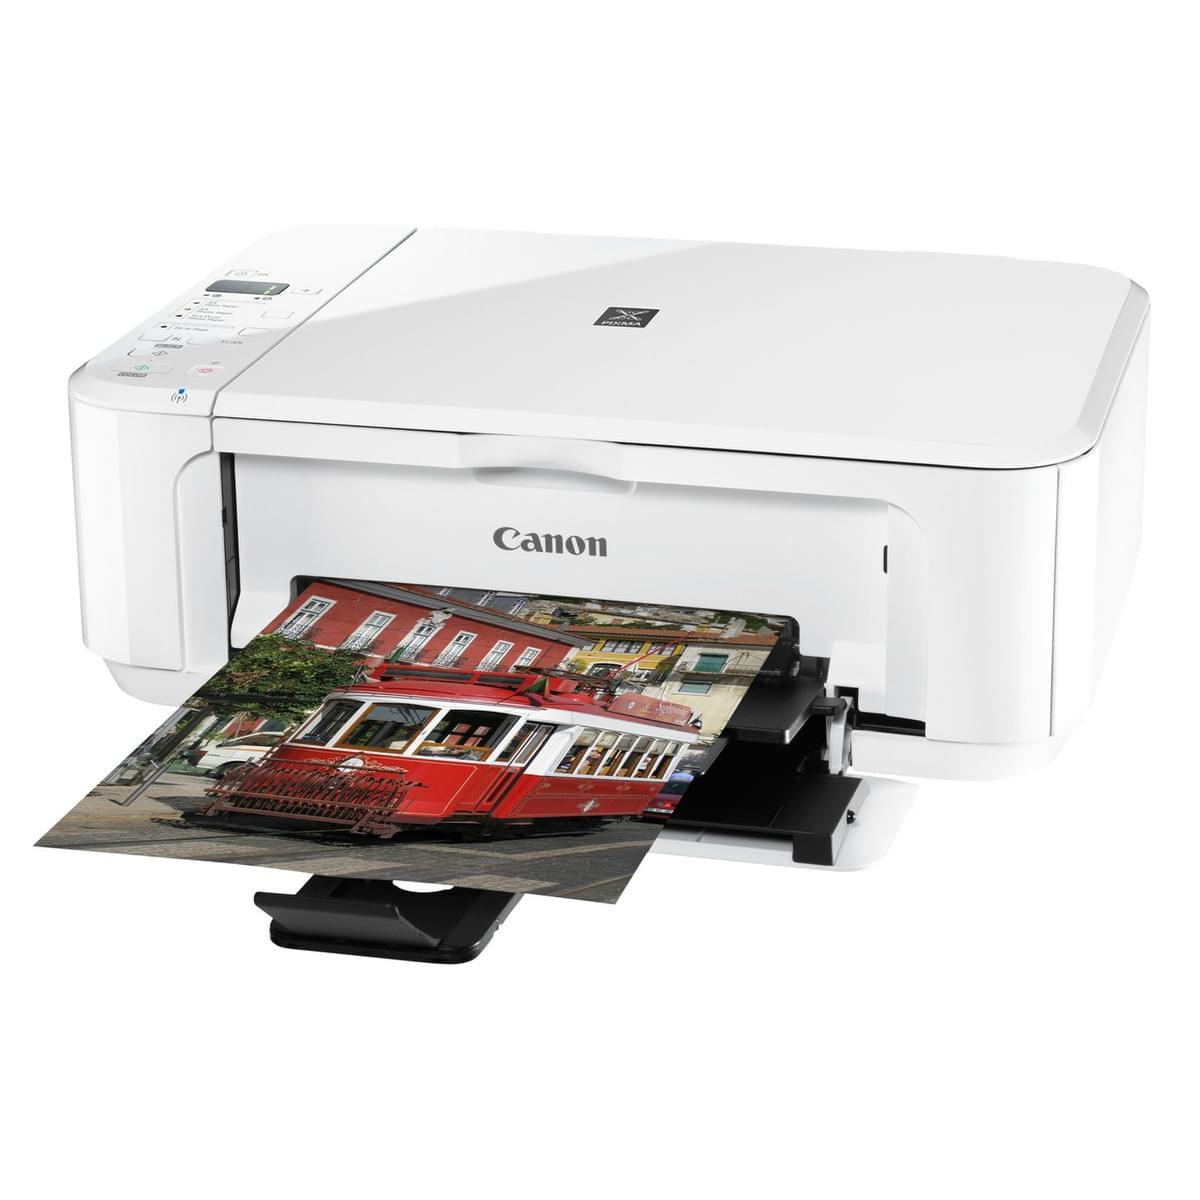 Canon PIXMA MG3150 Blanche (Recto-Verso / WiFi) (5289B050) - Achat / Vente Imprimante Multifonction sur Cybertek.fr - 0